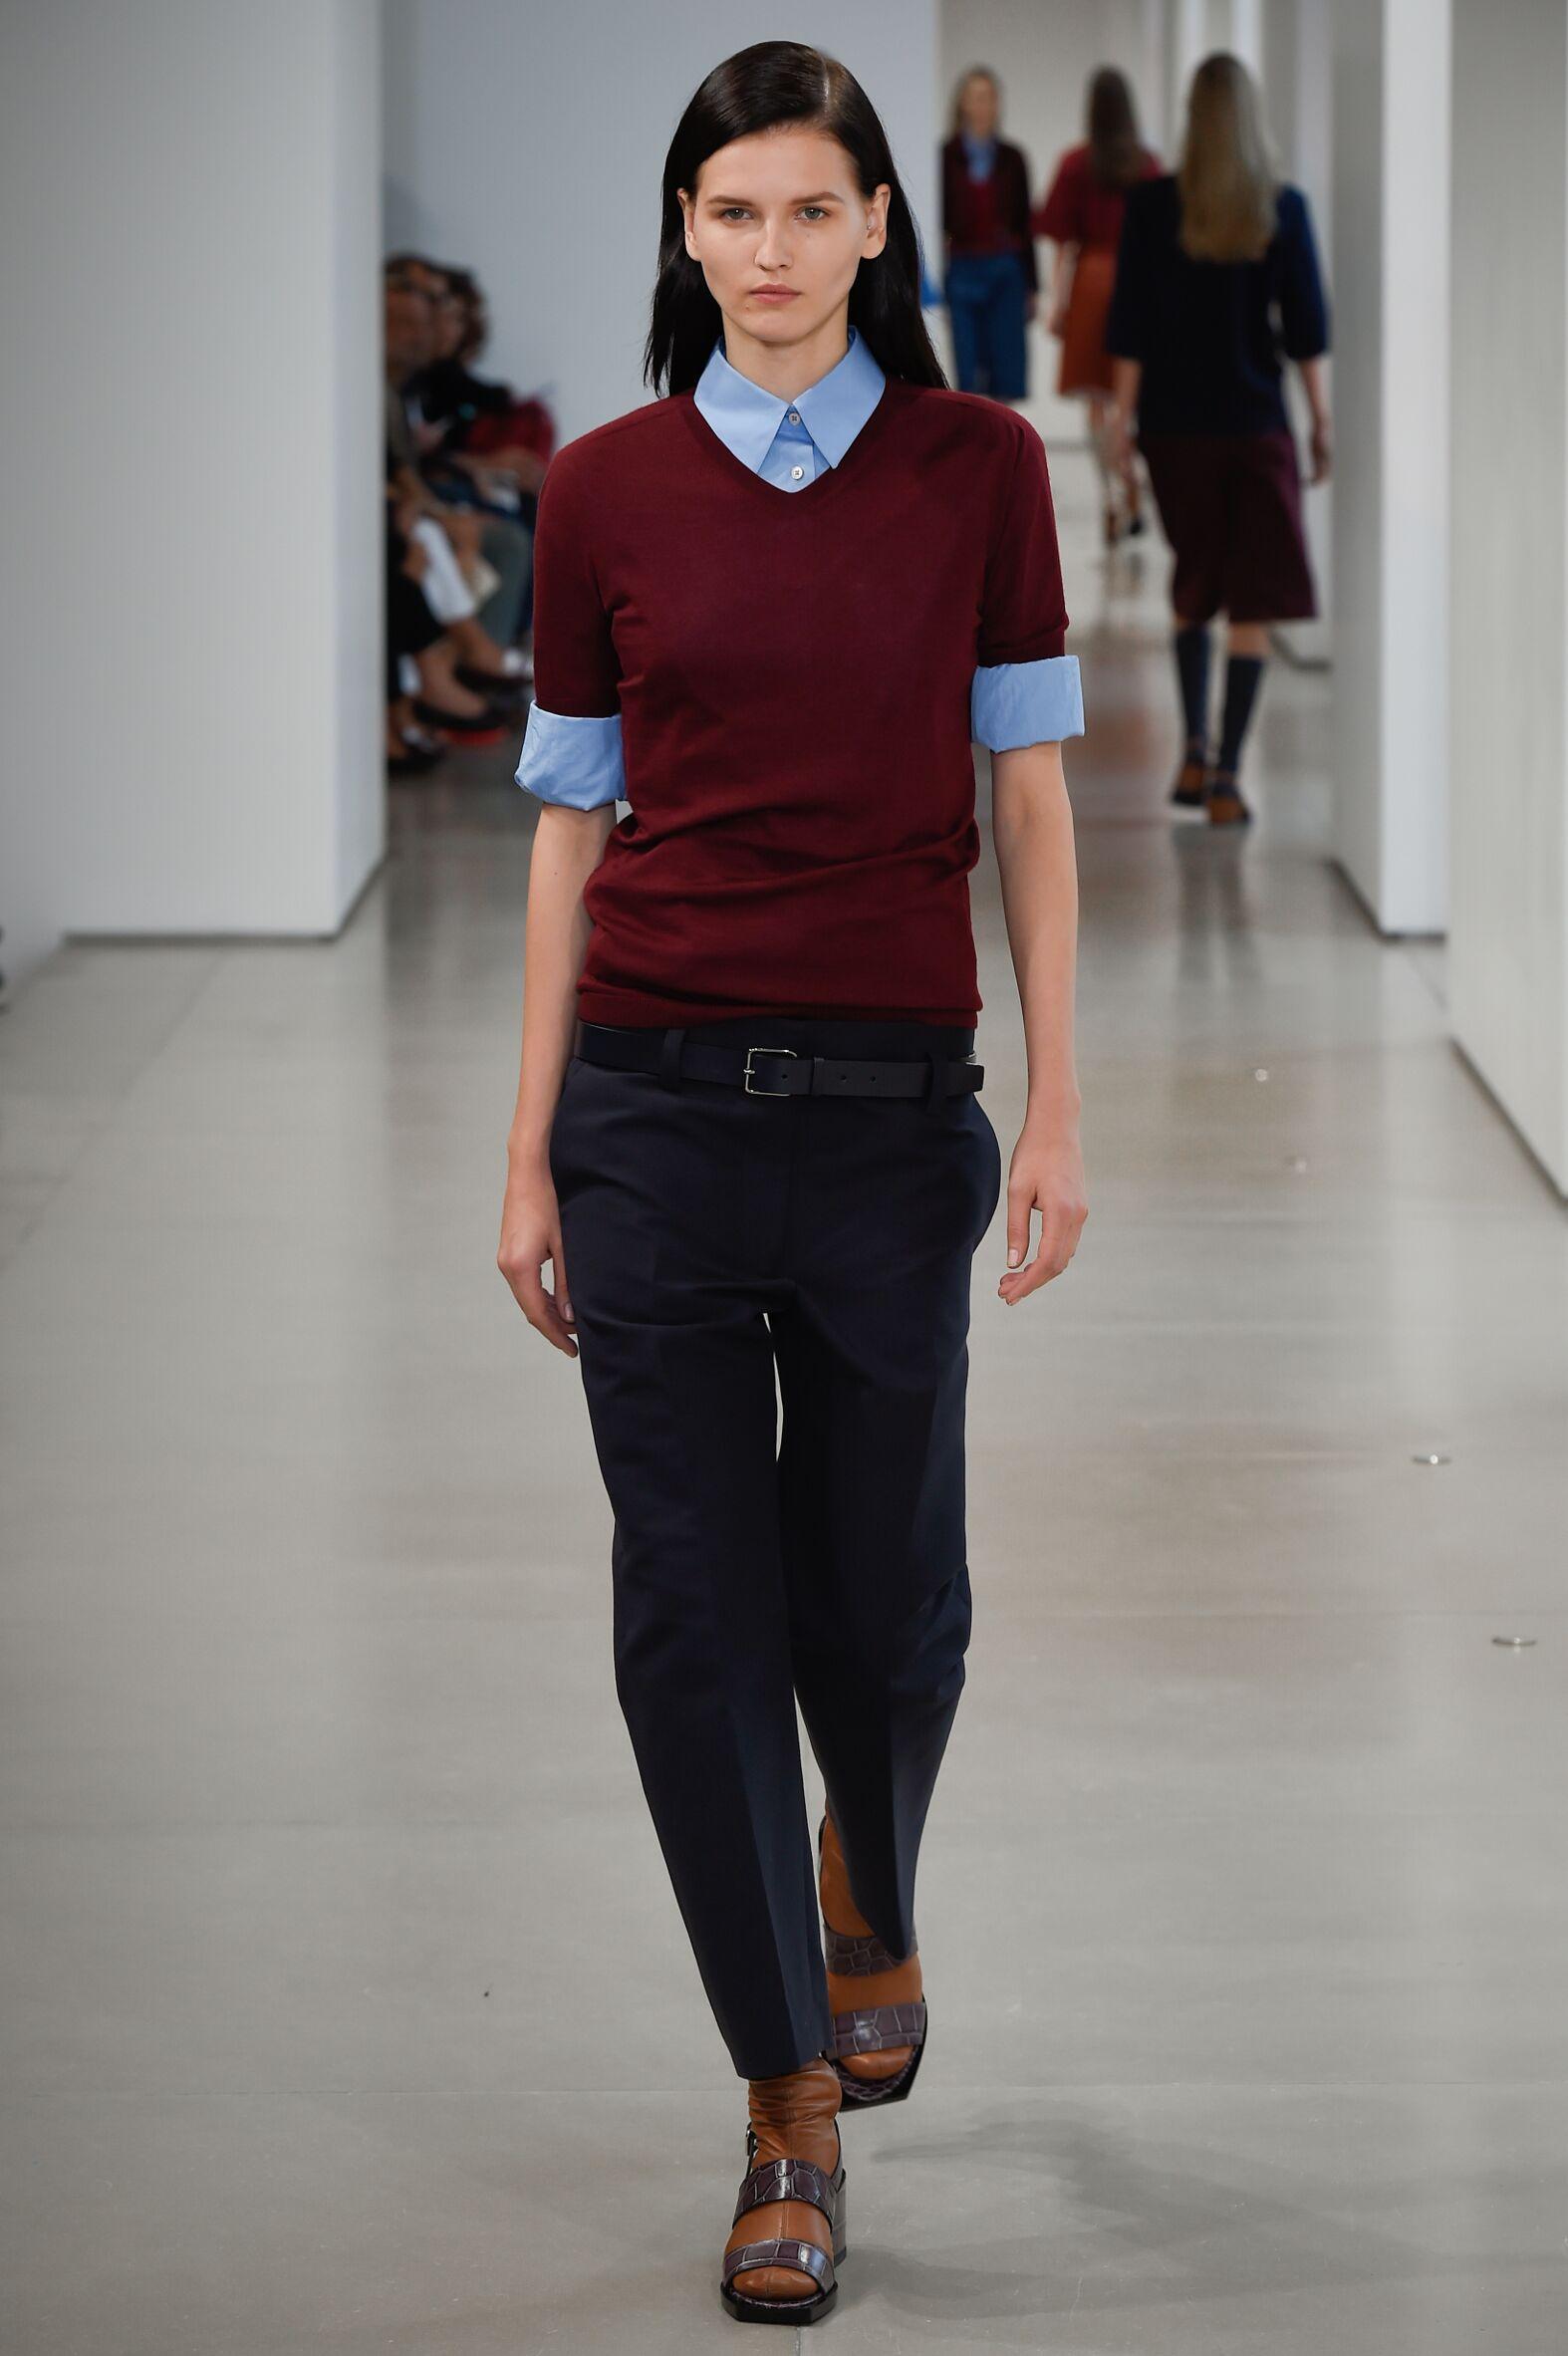 Jil Sander SS 2015 Womenswear